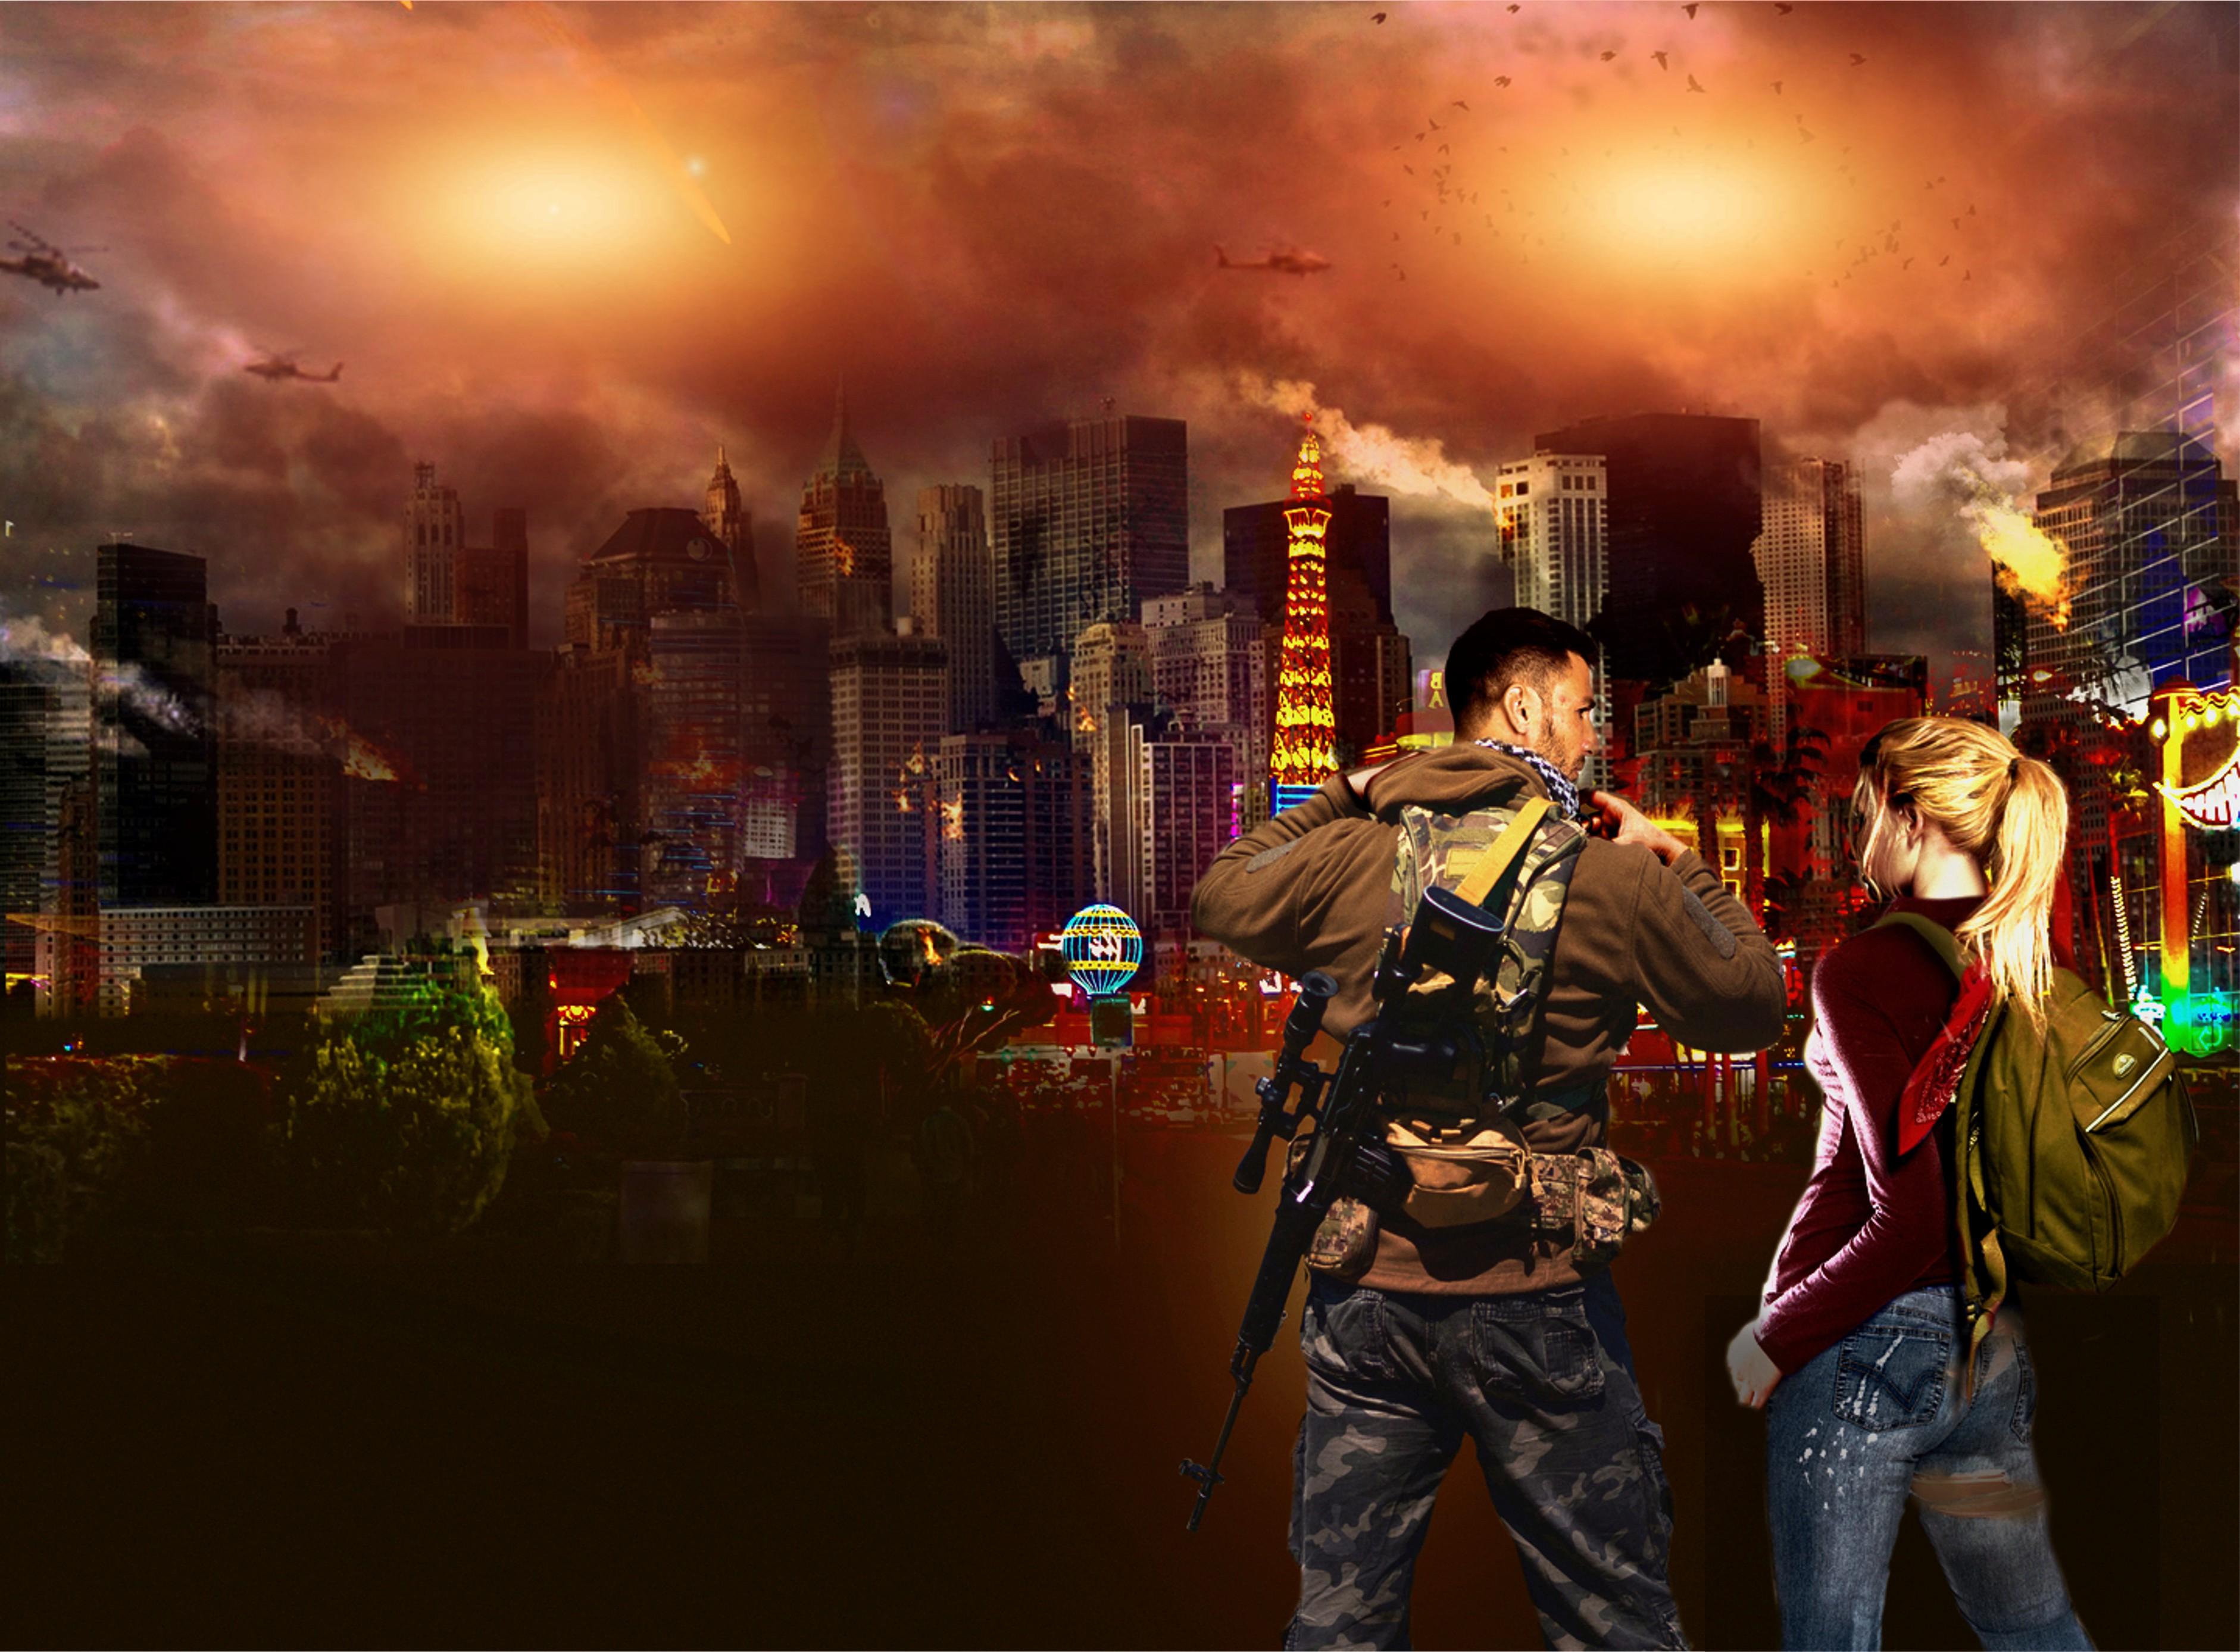 Post-Apocalyptic Las Vegas Book Cover